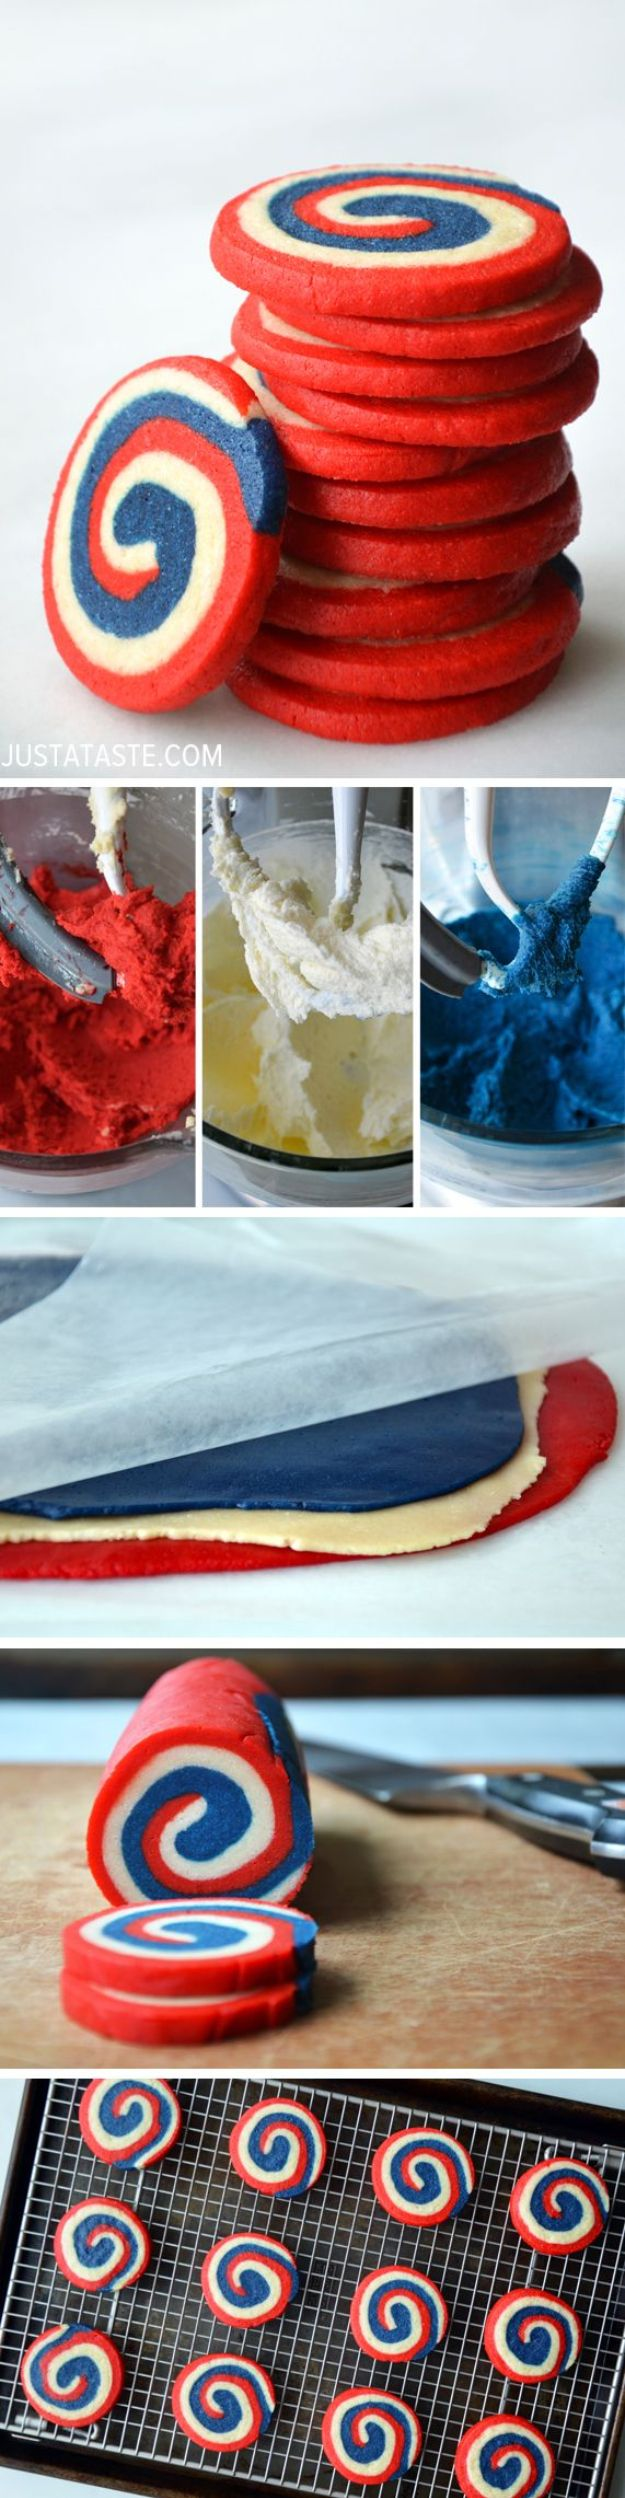 4th of July Dessert Ideas Patriotic Pinwheel Cookie Recipe